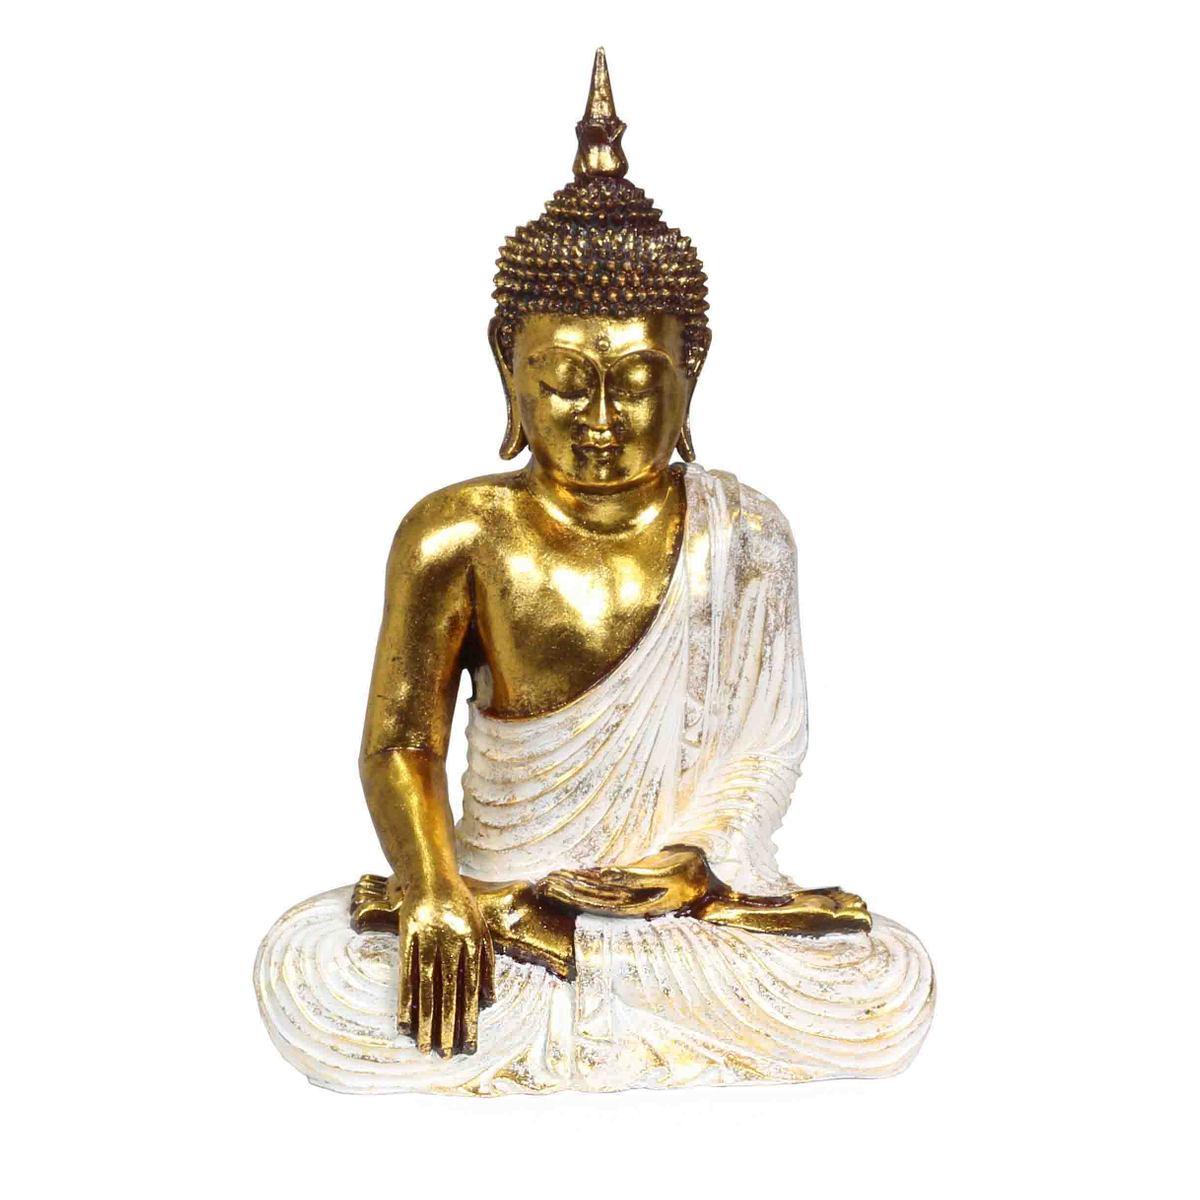 Buddha 3er Figur,19 cm Polyresin,Buddhismus Asien gold braun